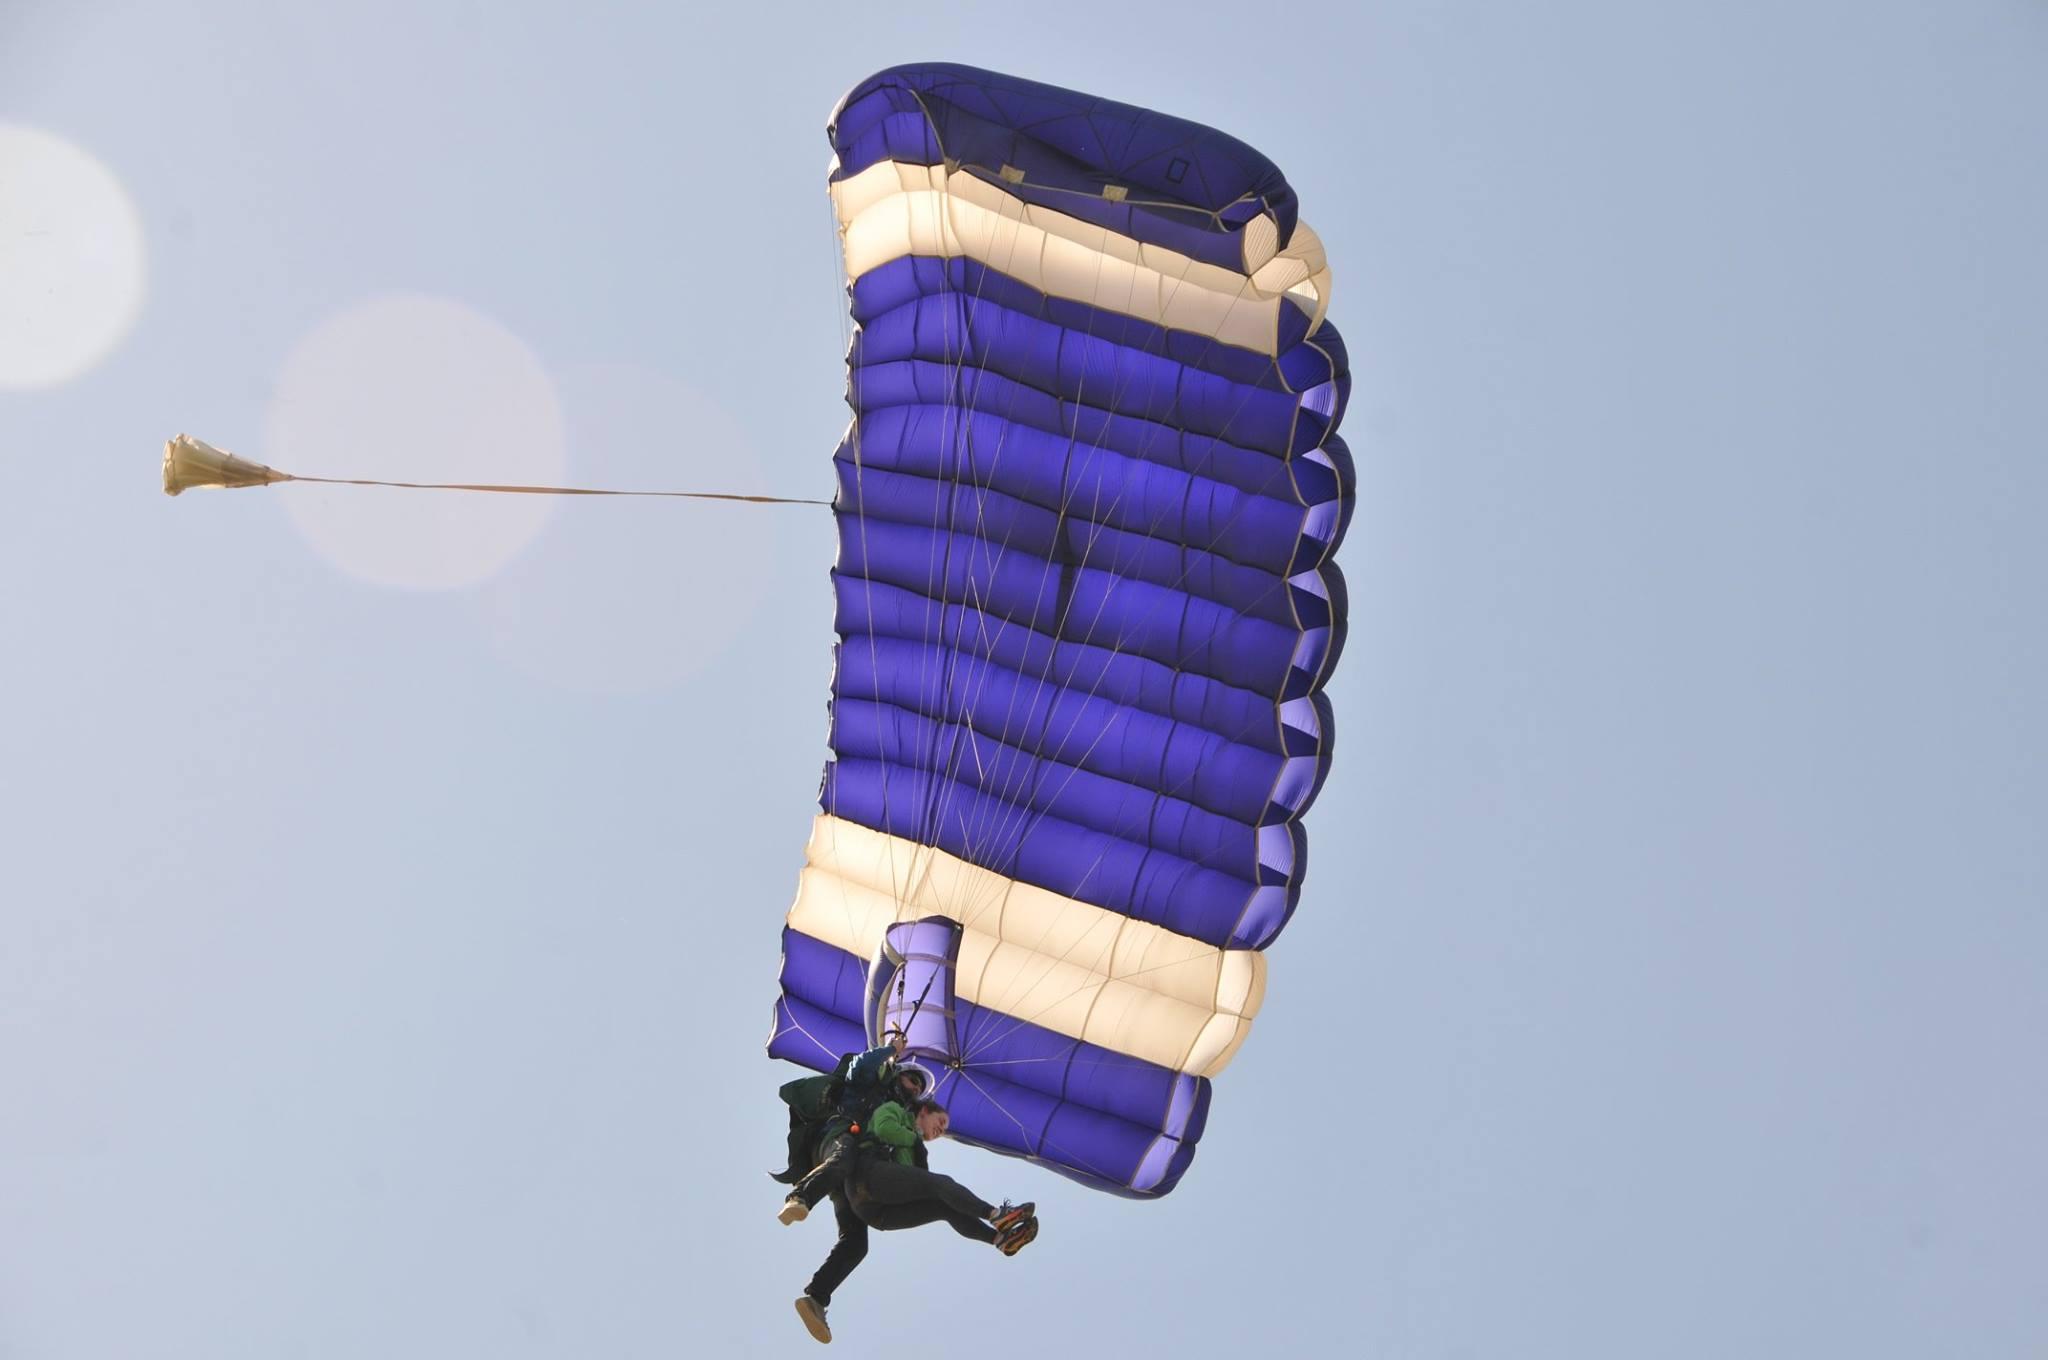 Tandem Skydive in BC